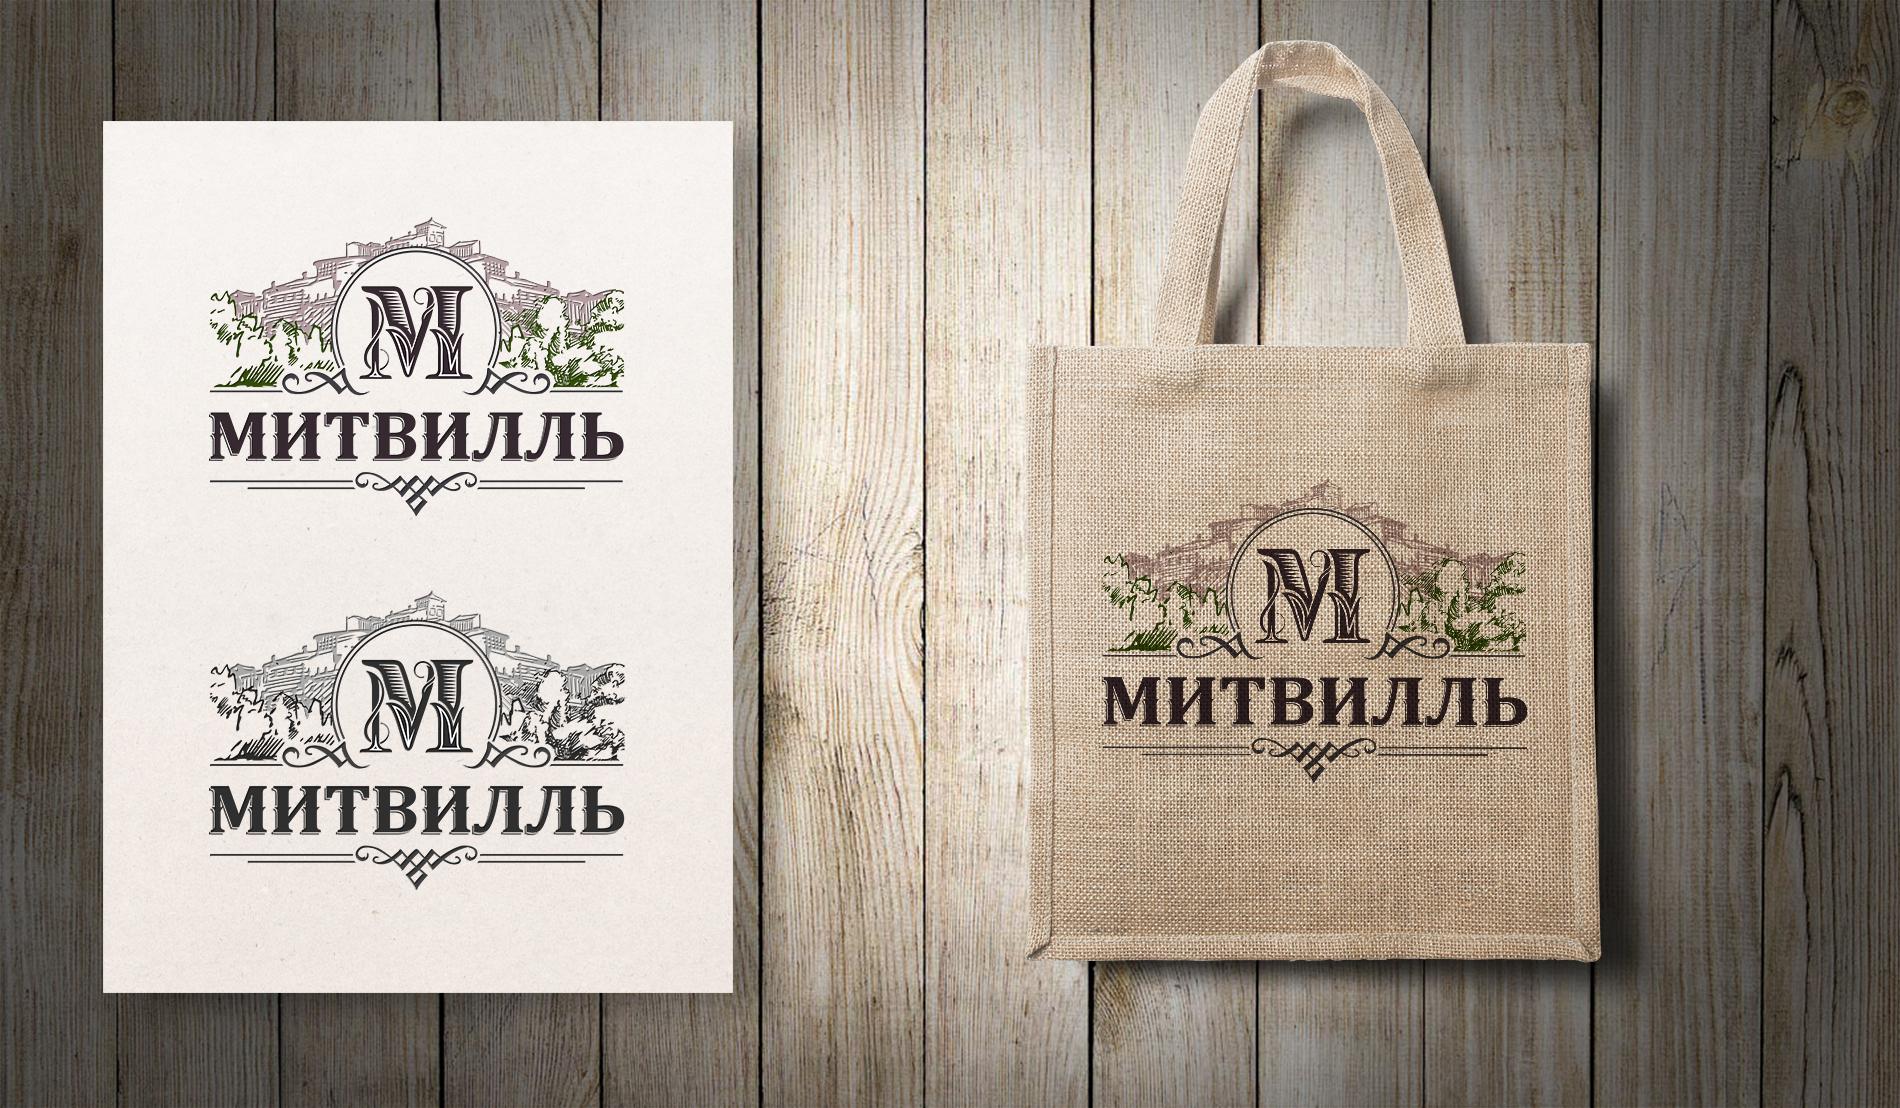 Логотип Митвилль